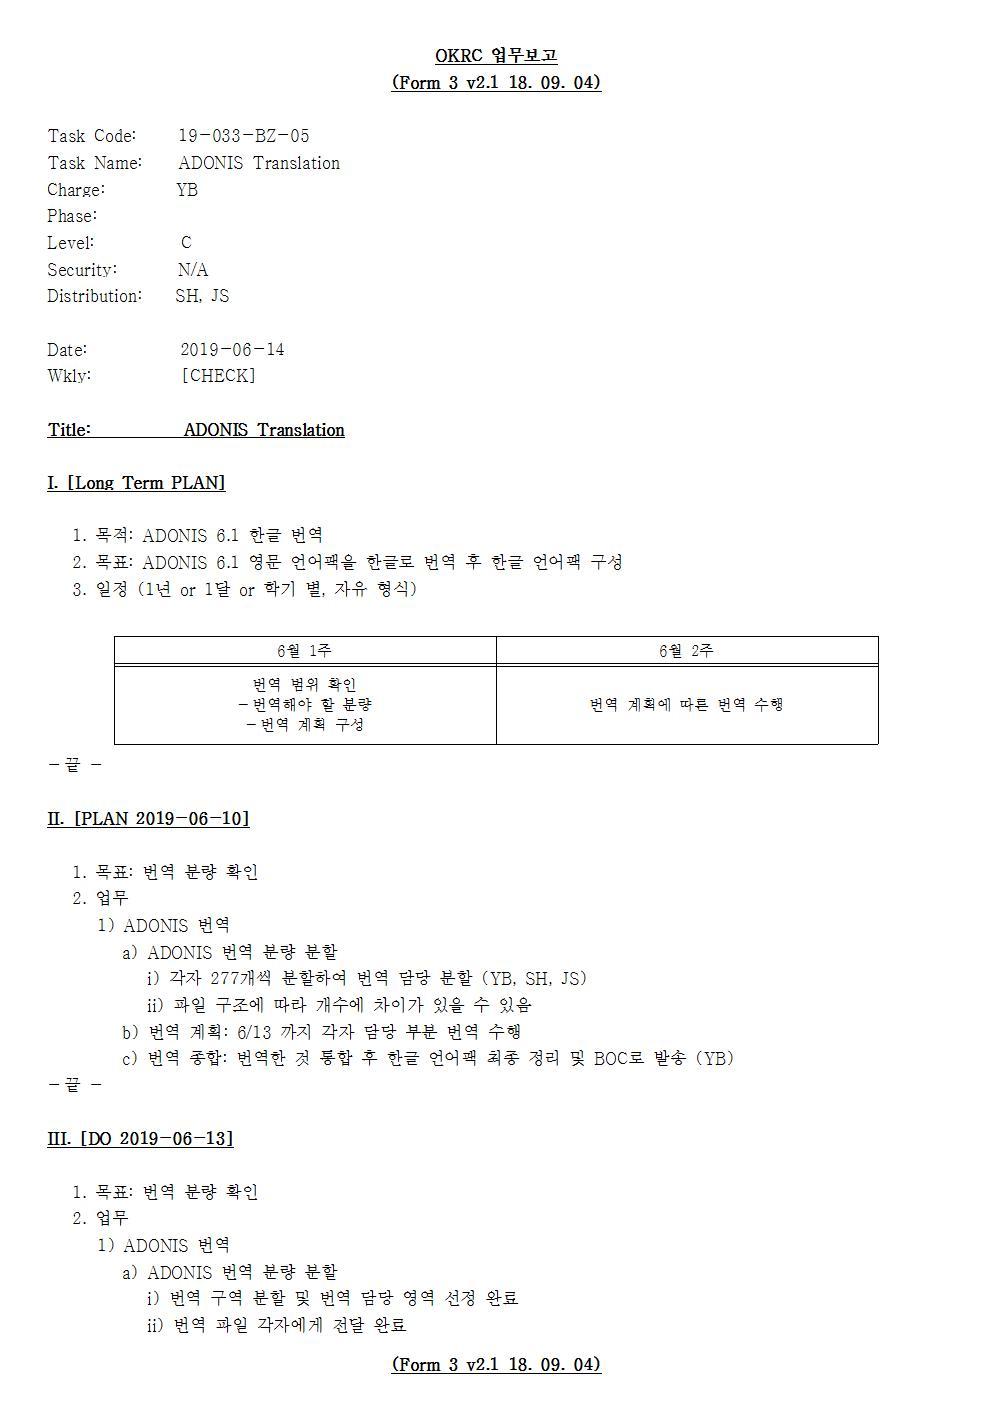 D-[19-033-BZ-05]-[ADONIS Translation]-[2019-06-14][YB]-[19-6-2]-[P+D+C]001.jpg